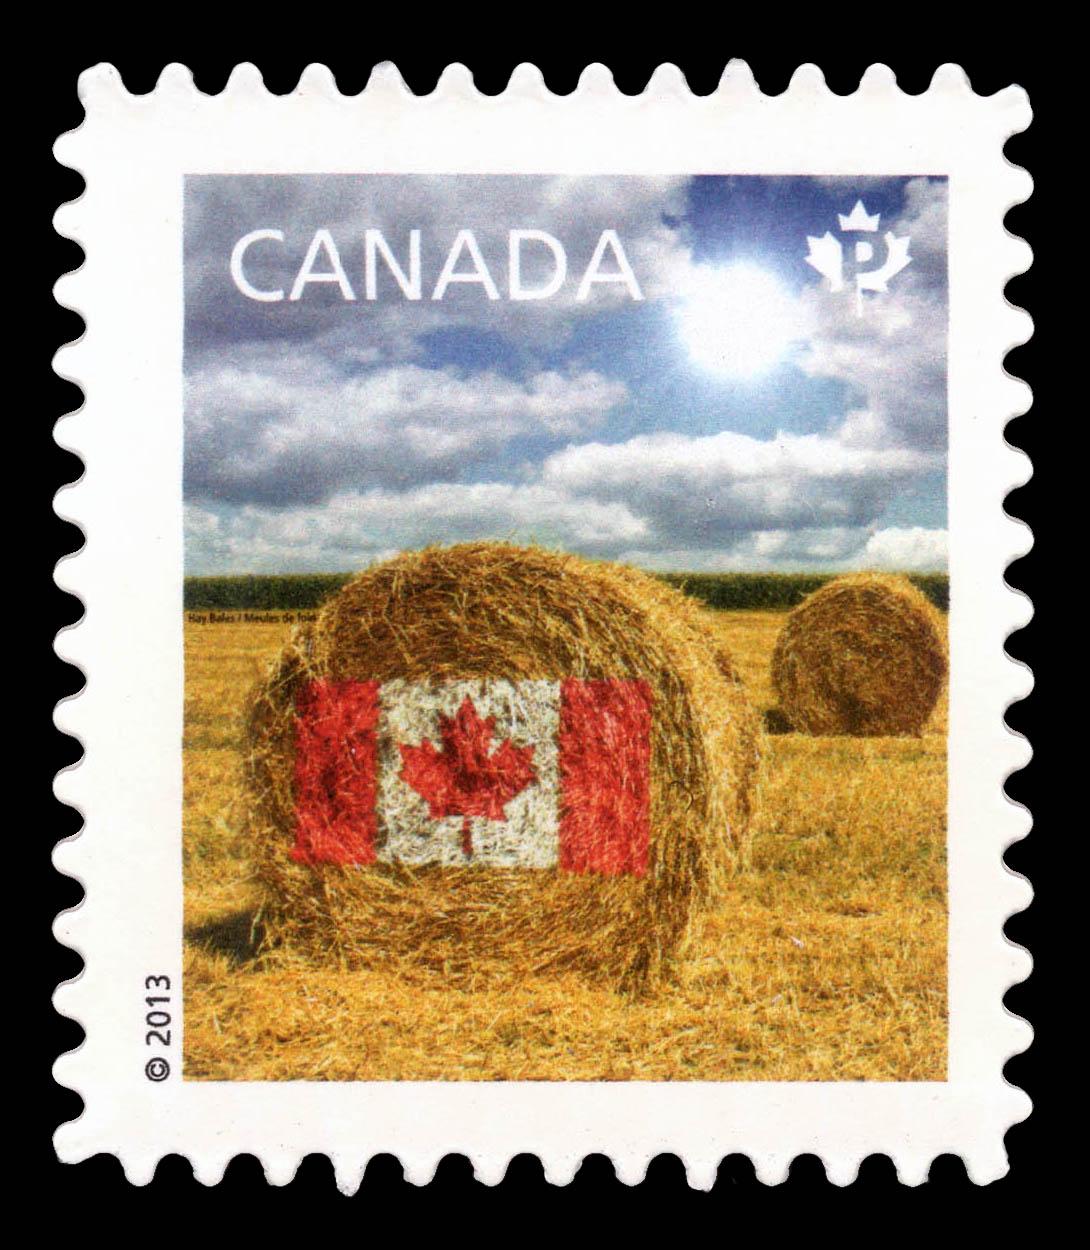 Prairie Hay Bale Flag Design Canada Postage Stamp | Canadian Pride - Definitives